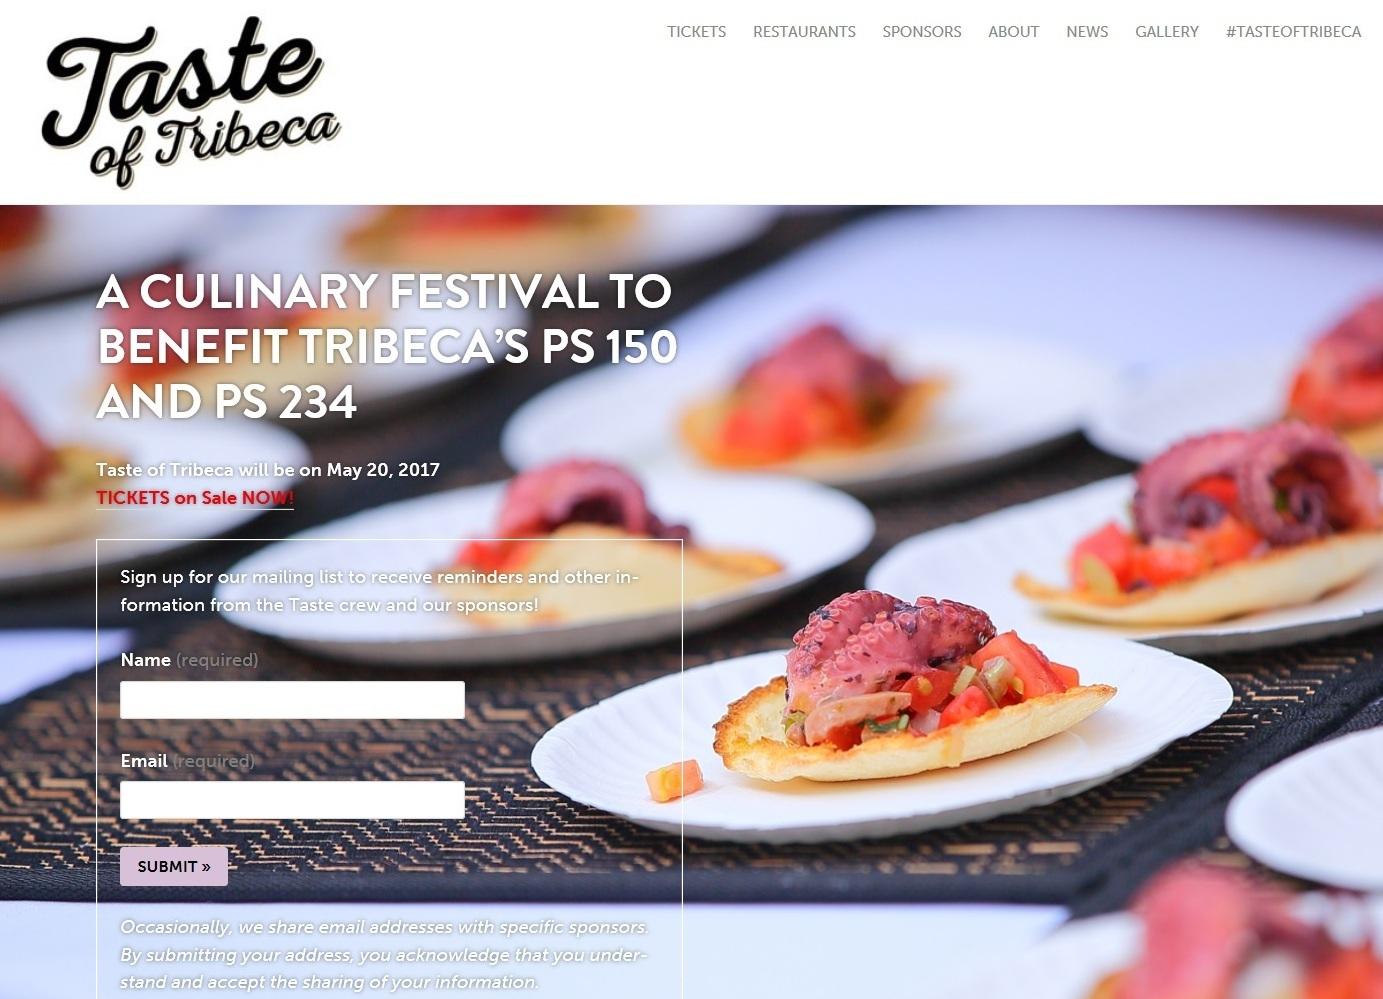 Taste of Tribeca 2017 ホームページ 写真掲載について_a0274805_13113486.jpg